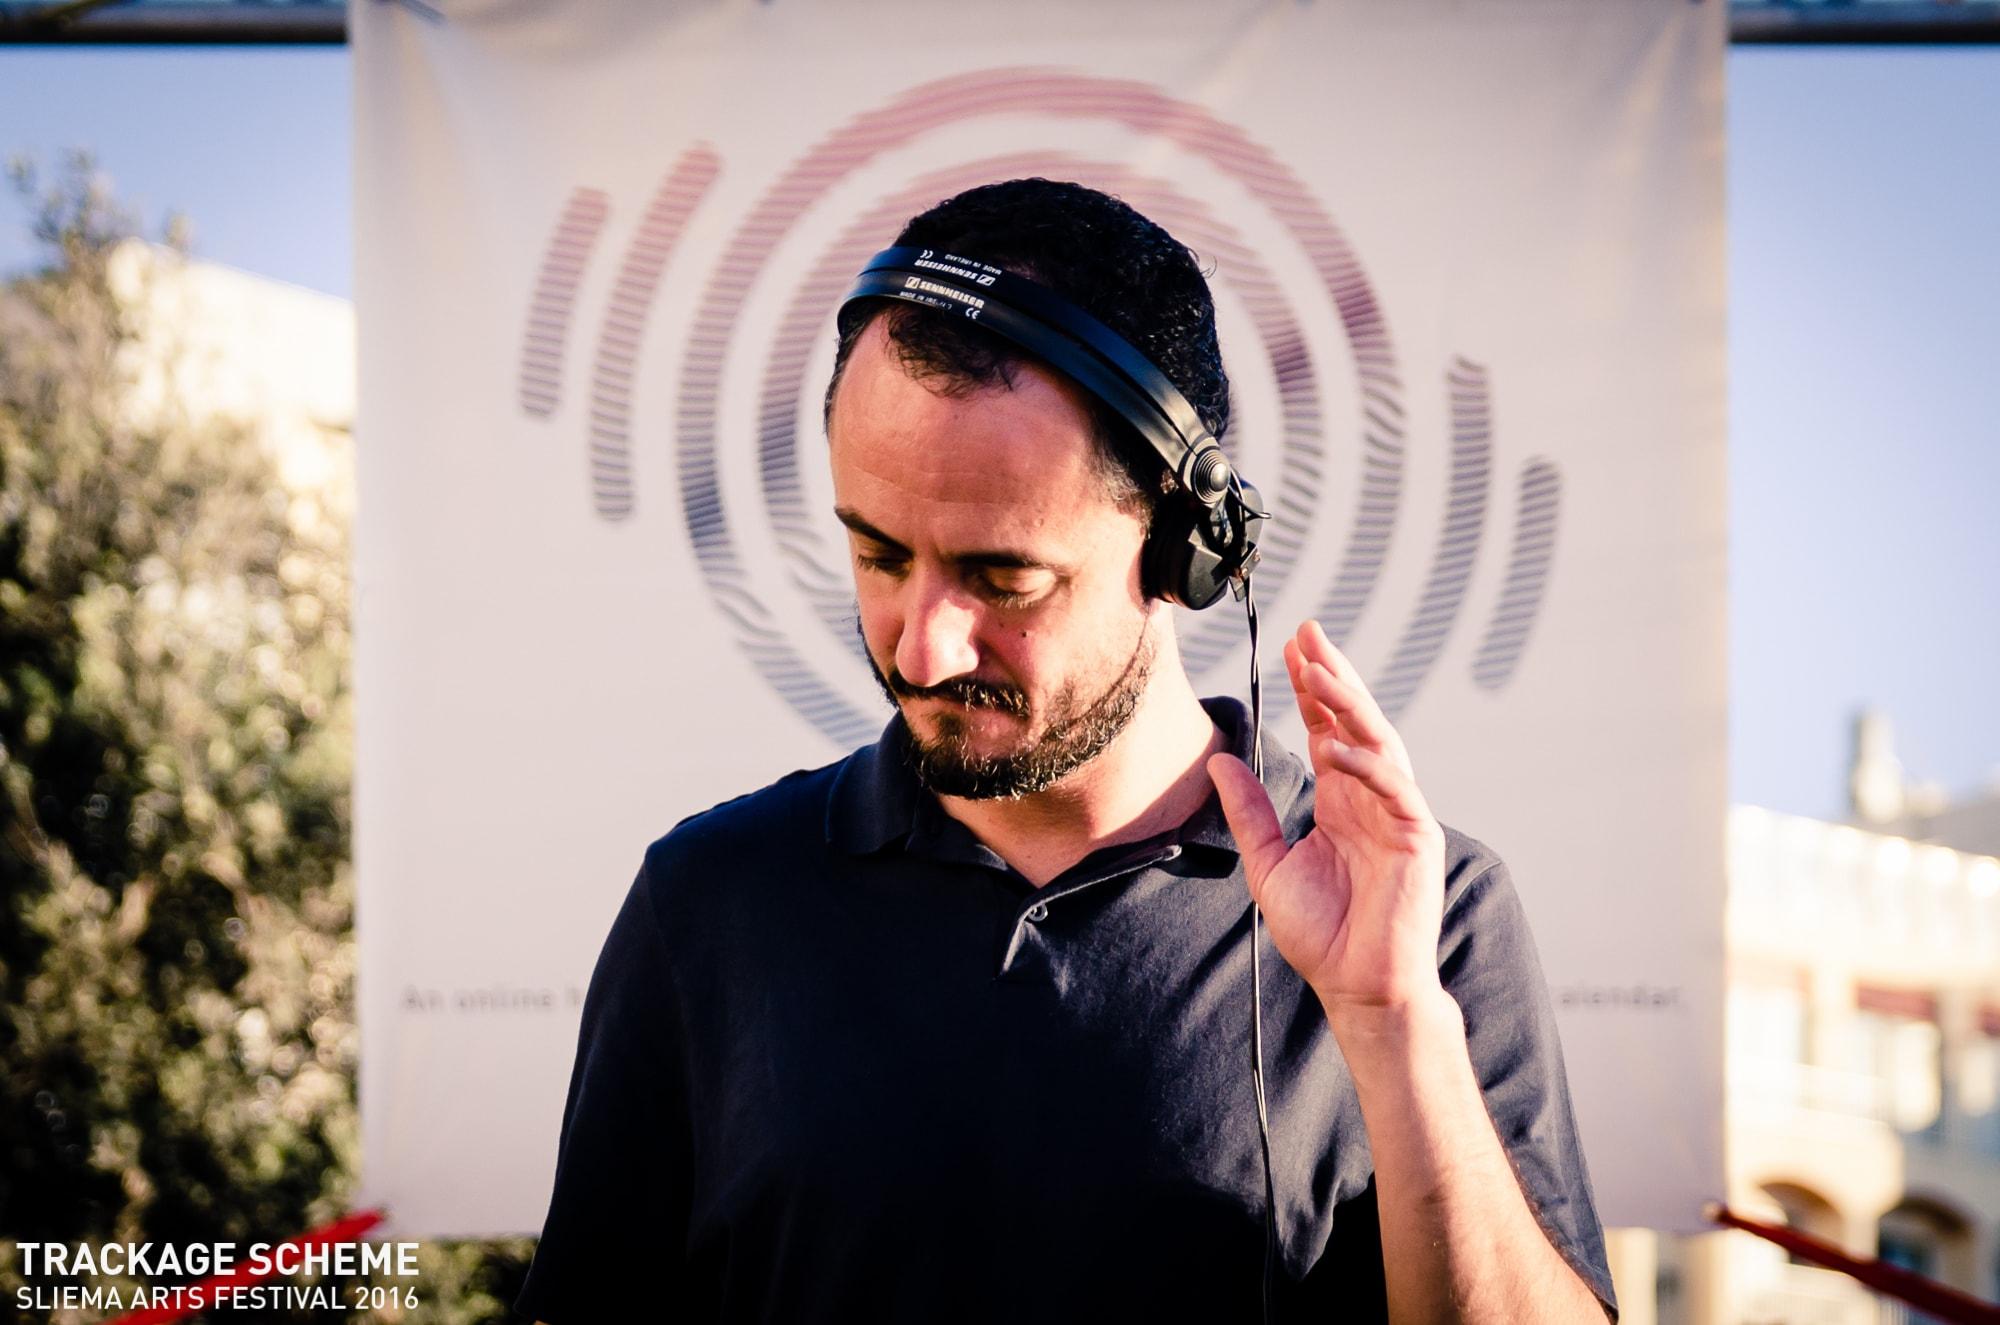 sliema arts festival trackage scheme frankie calleja cancelled 1